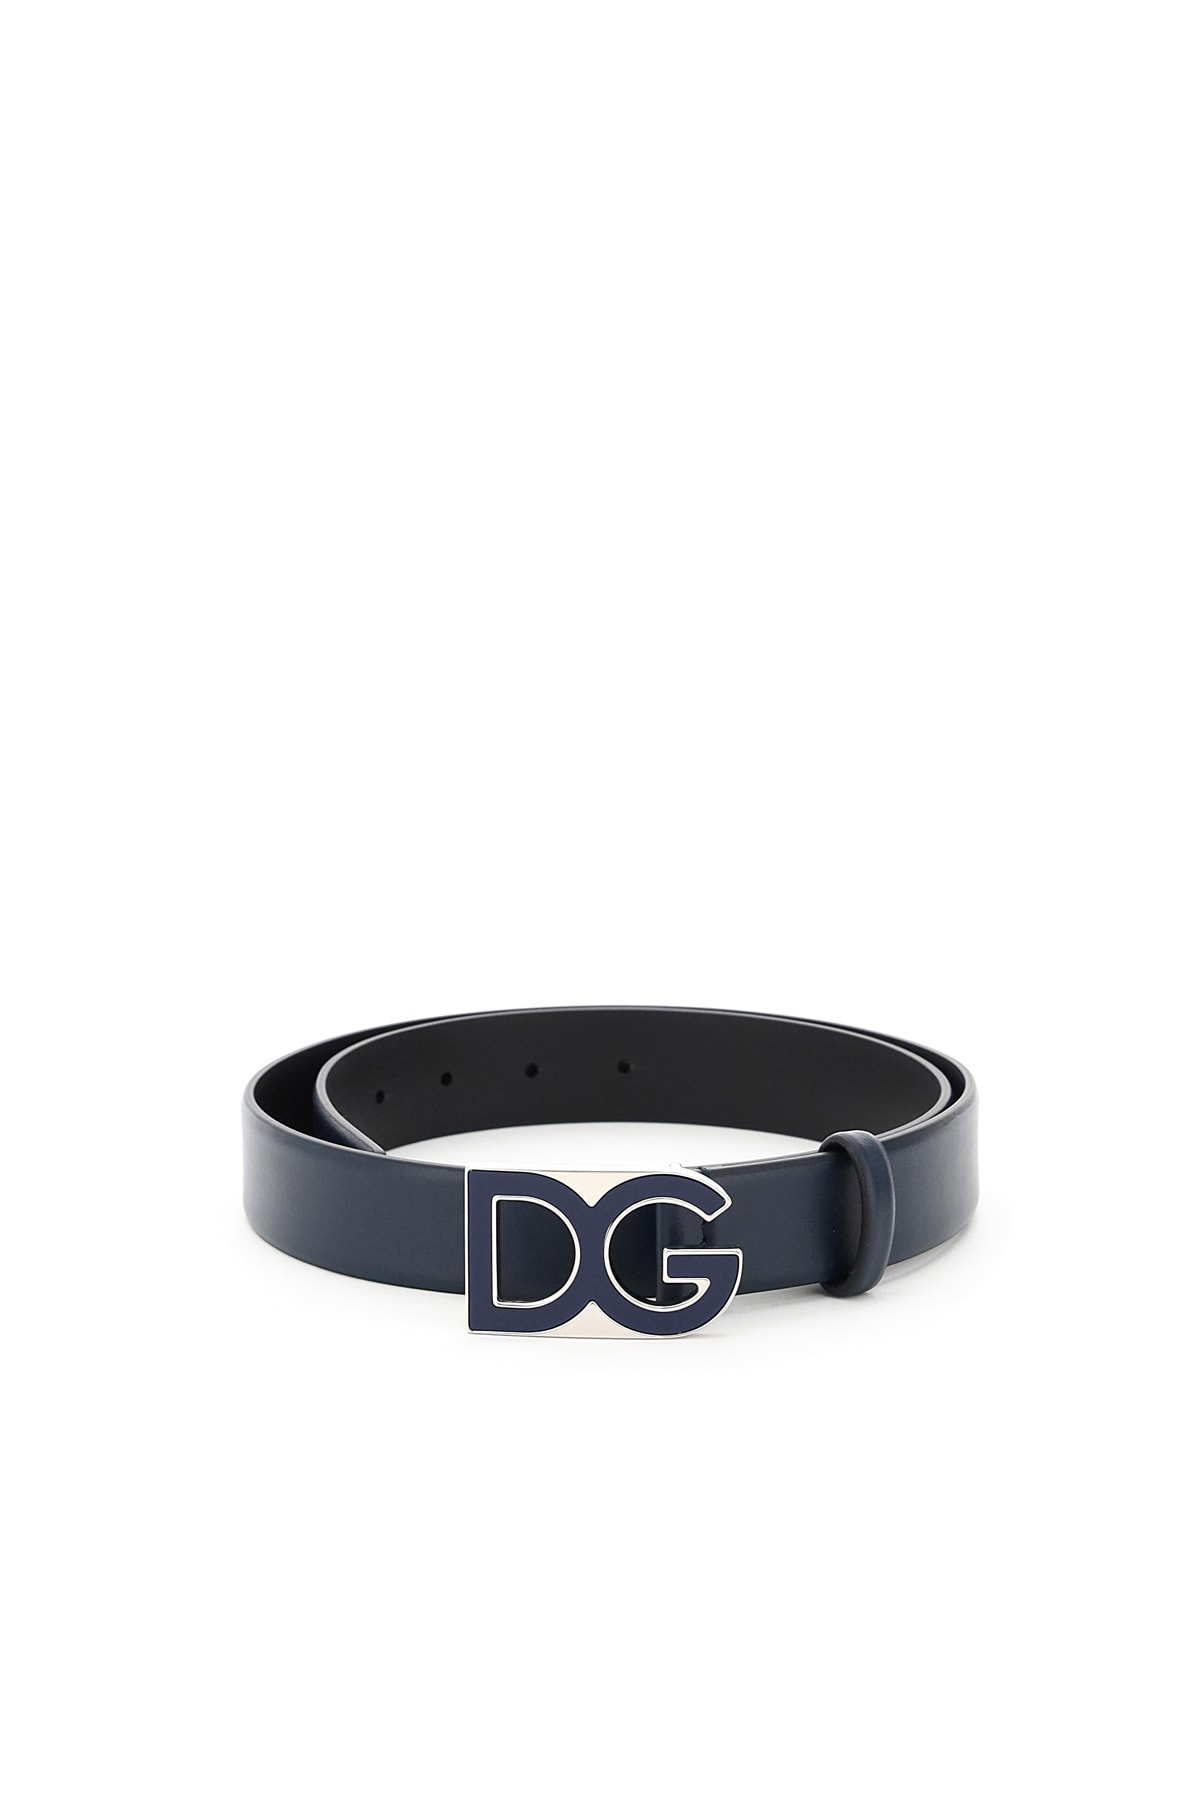 Dolce & Gabbana Belts DG LEATHER BELT